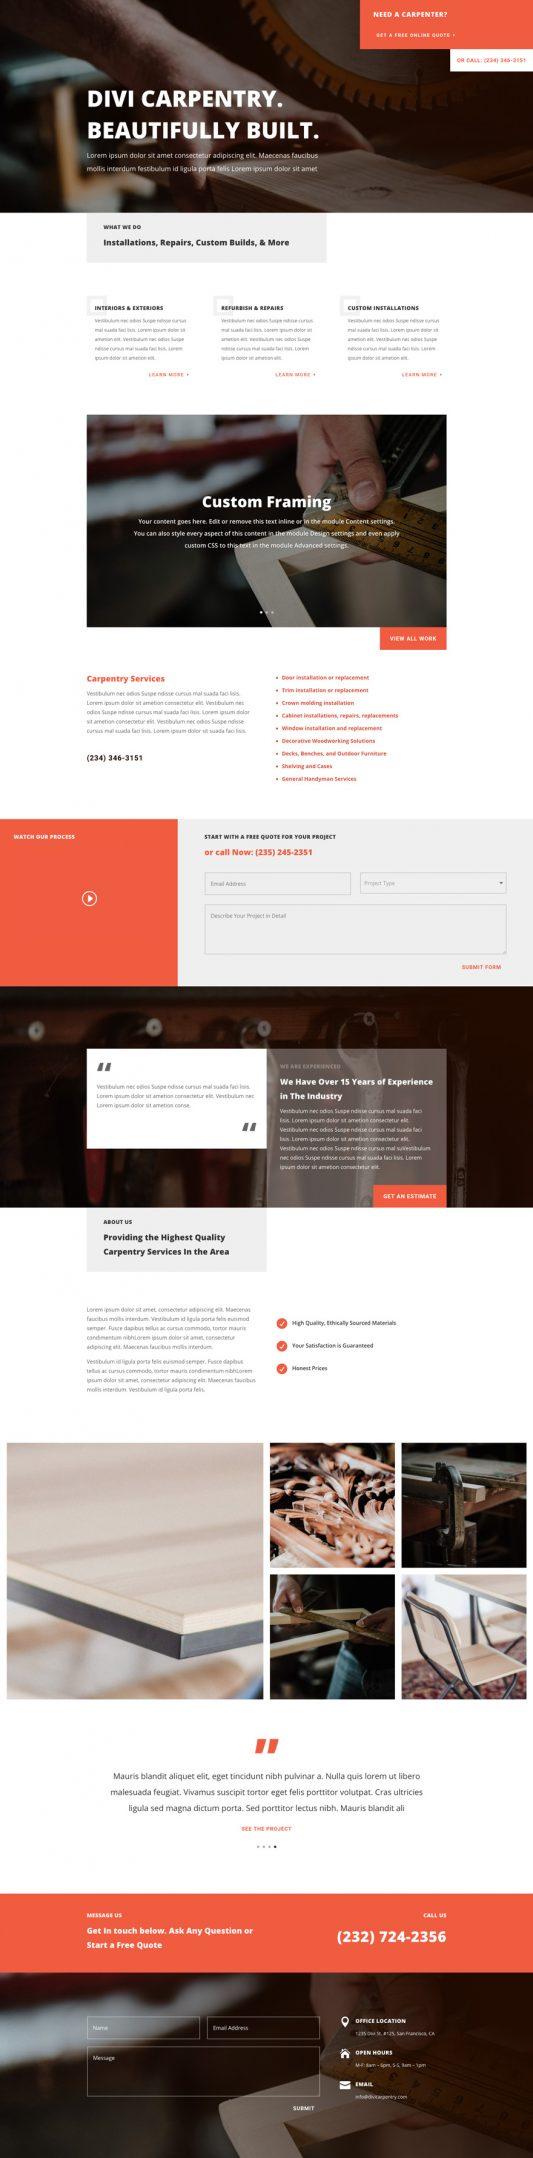 Elegant Themes - Divi - carpenter-landing-page-533x2158